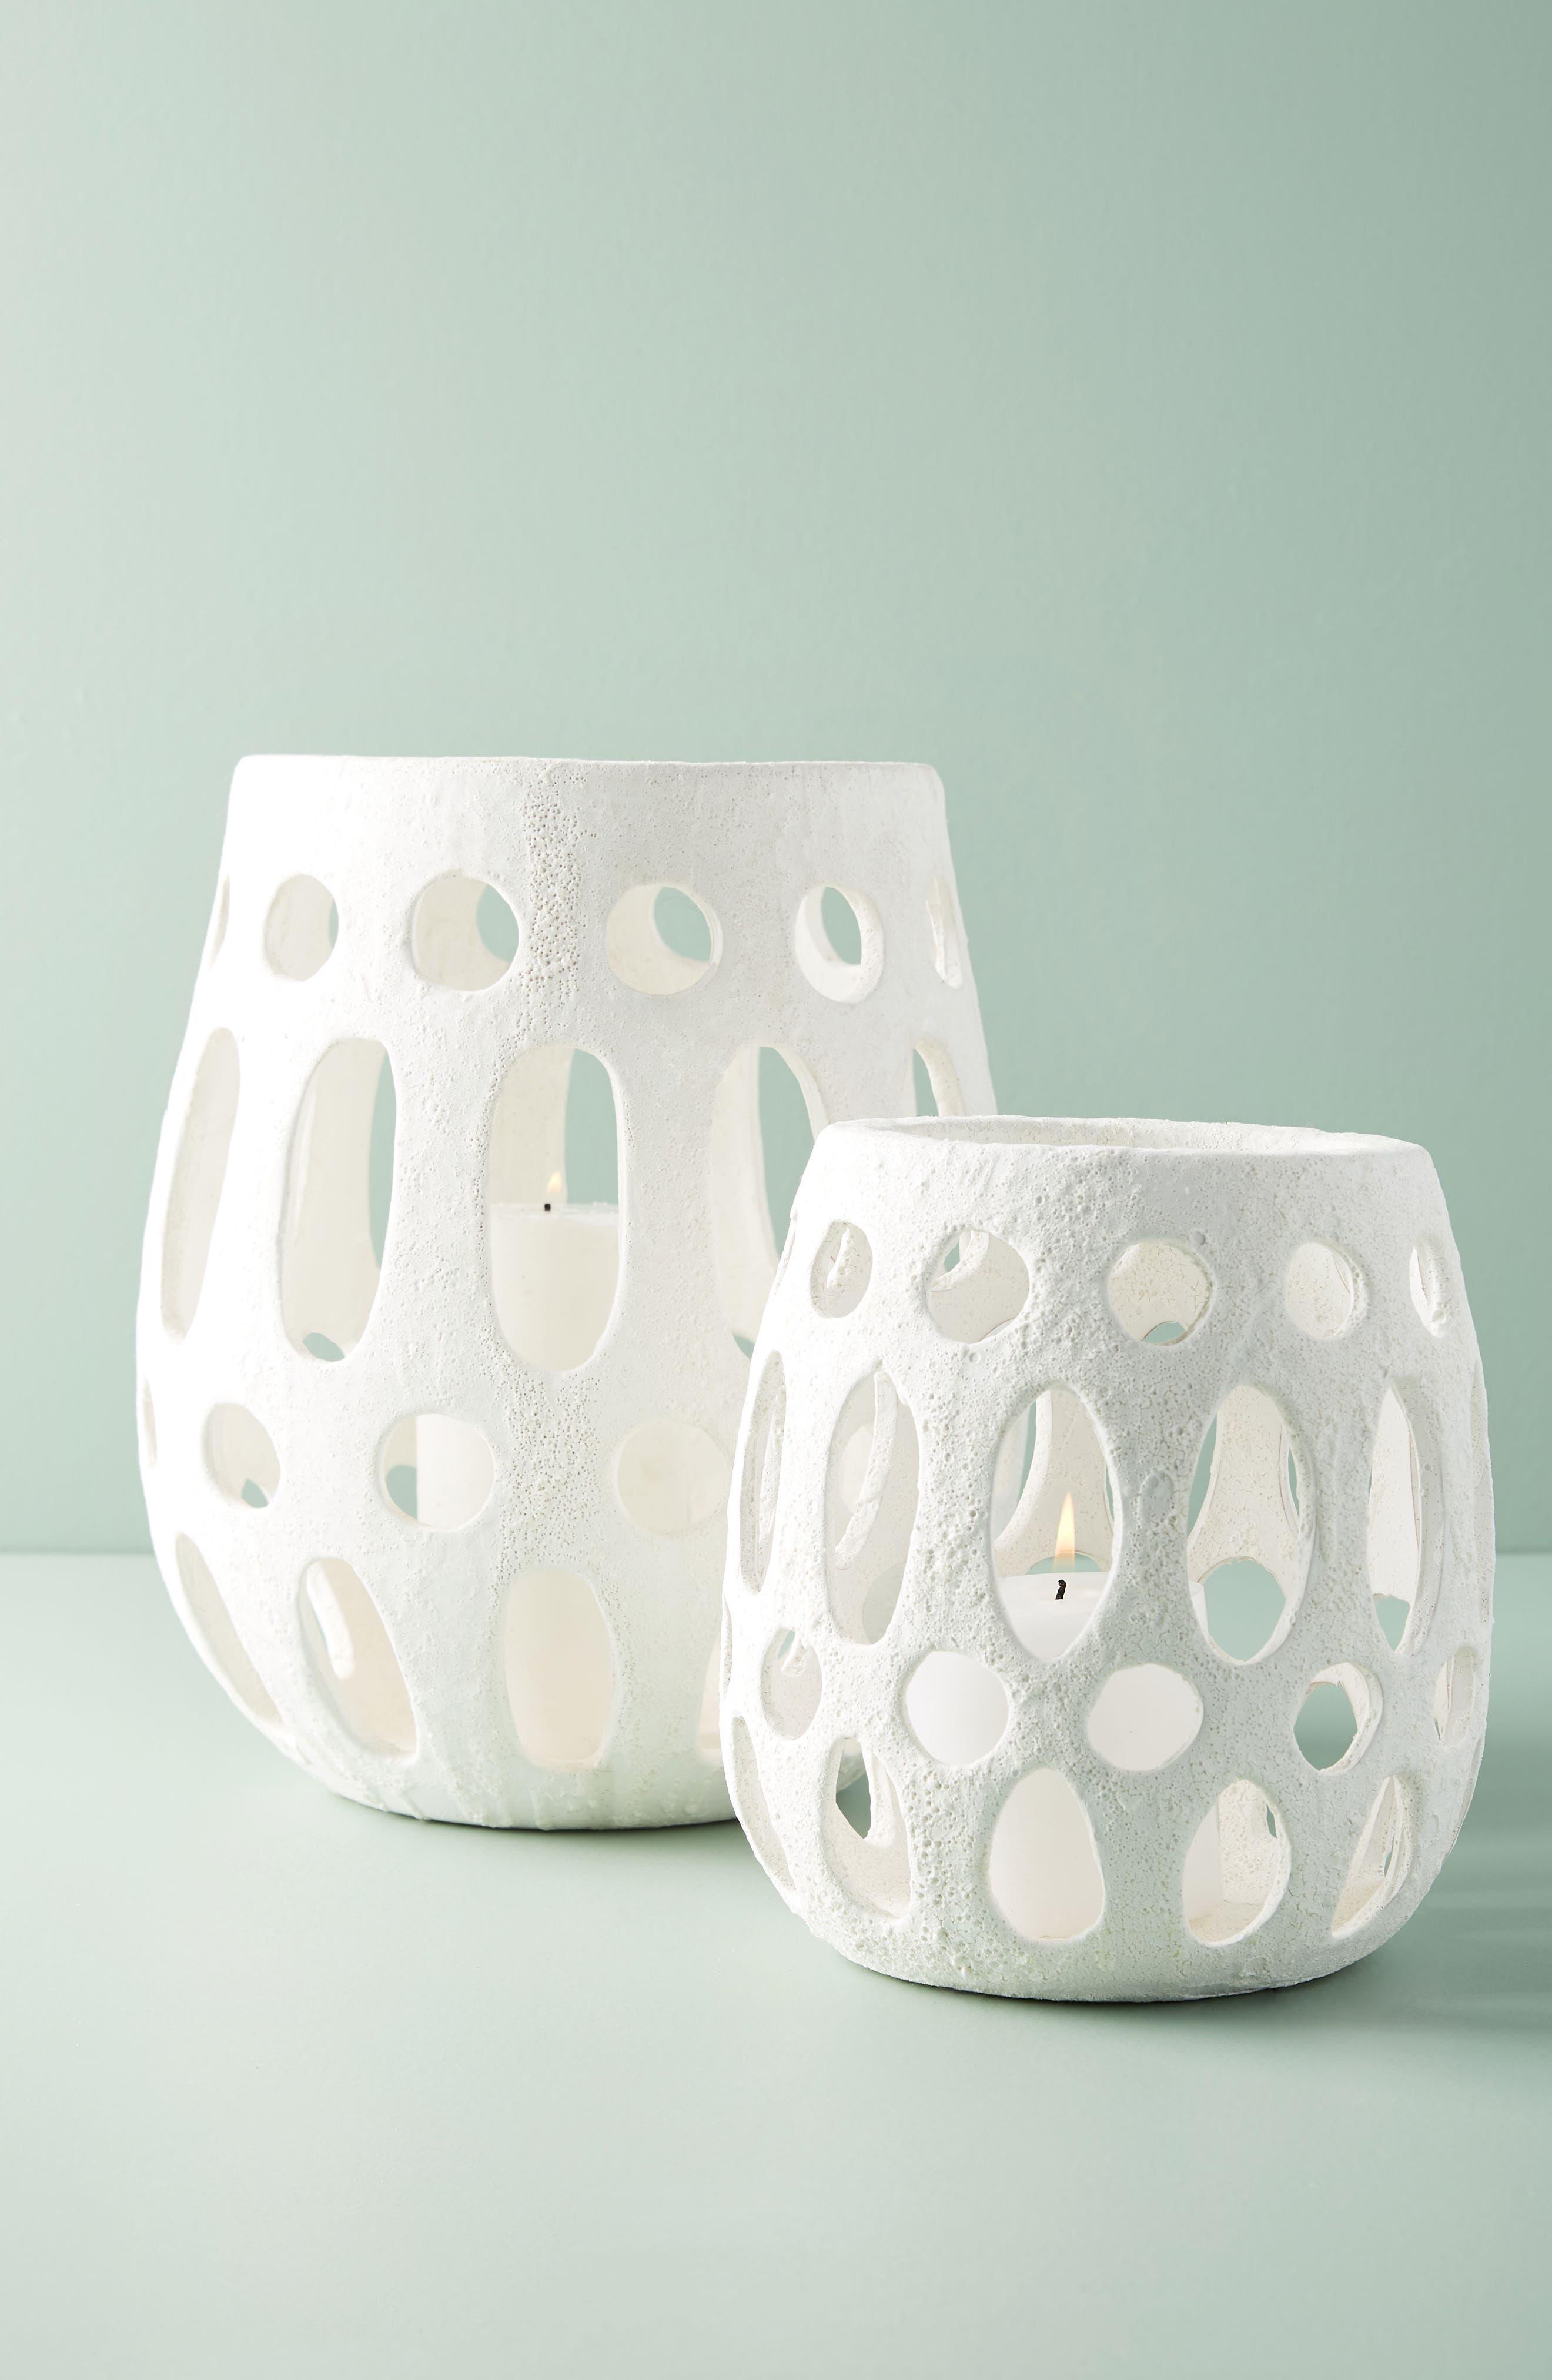 Hand Carved Ceramic Hurricane Candleholder,                         Main,                         color, WHITE - LARGE